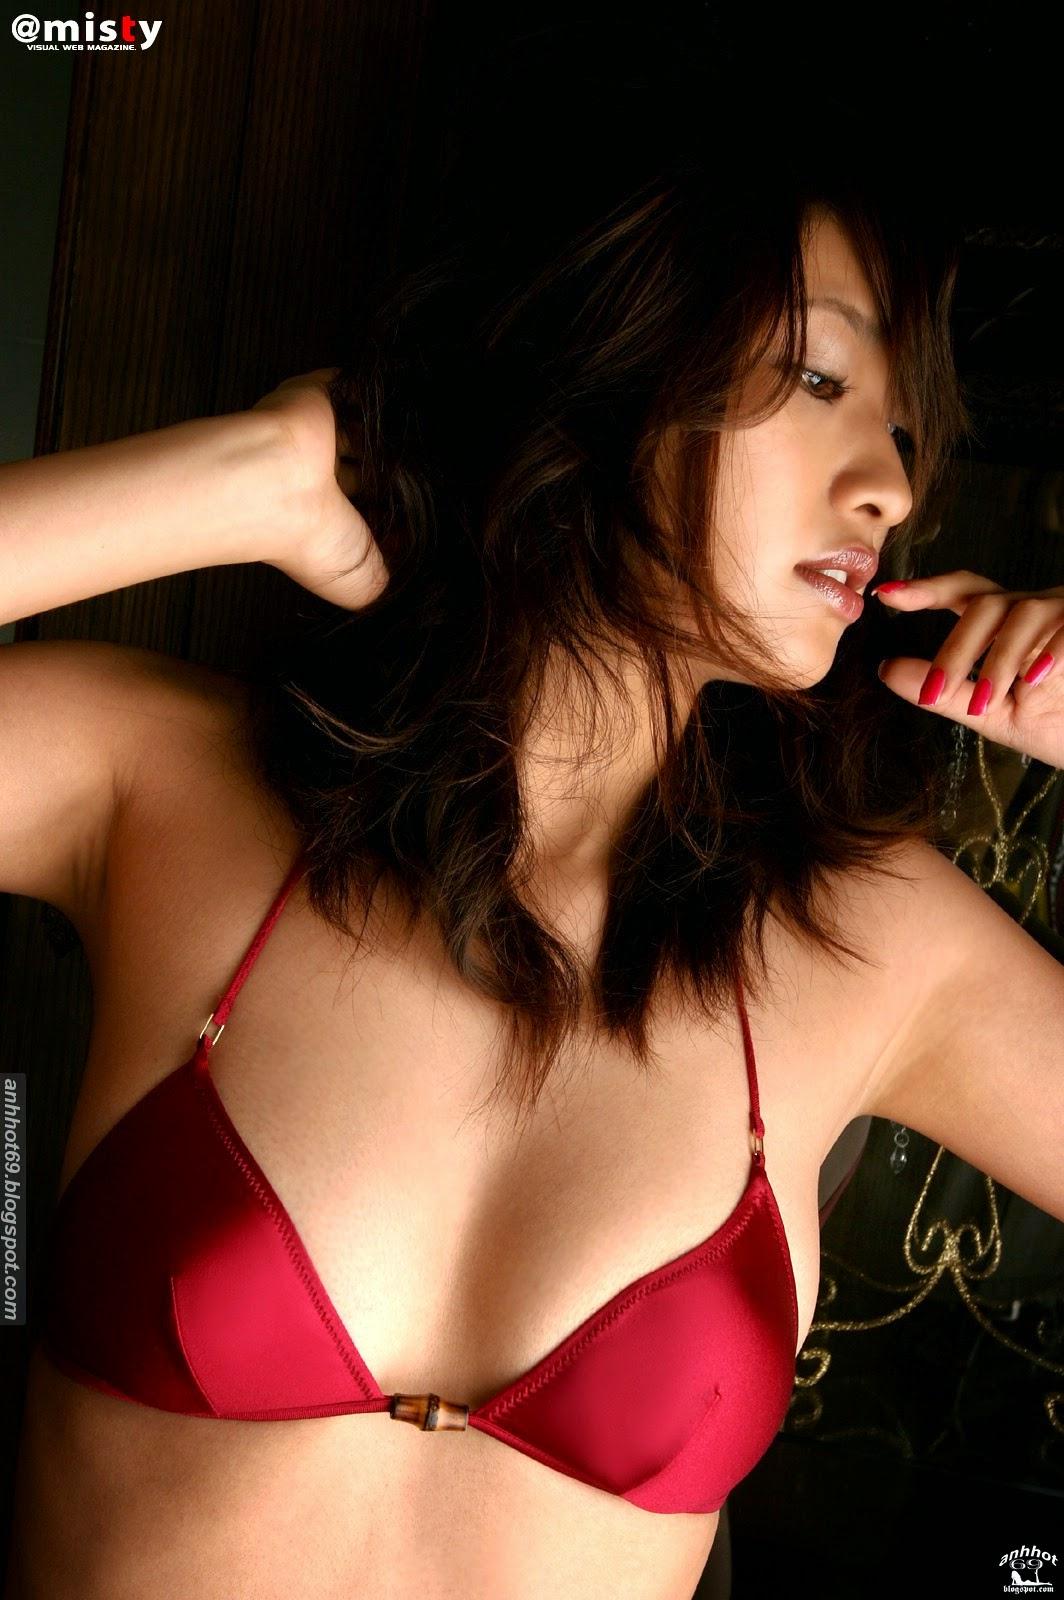 sayaka-ando-02013486